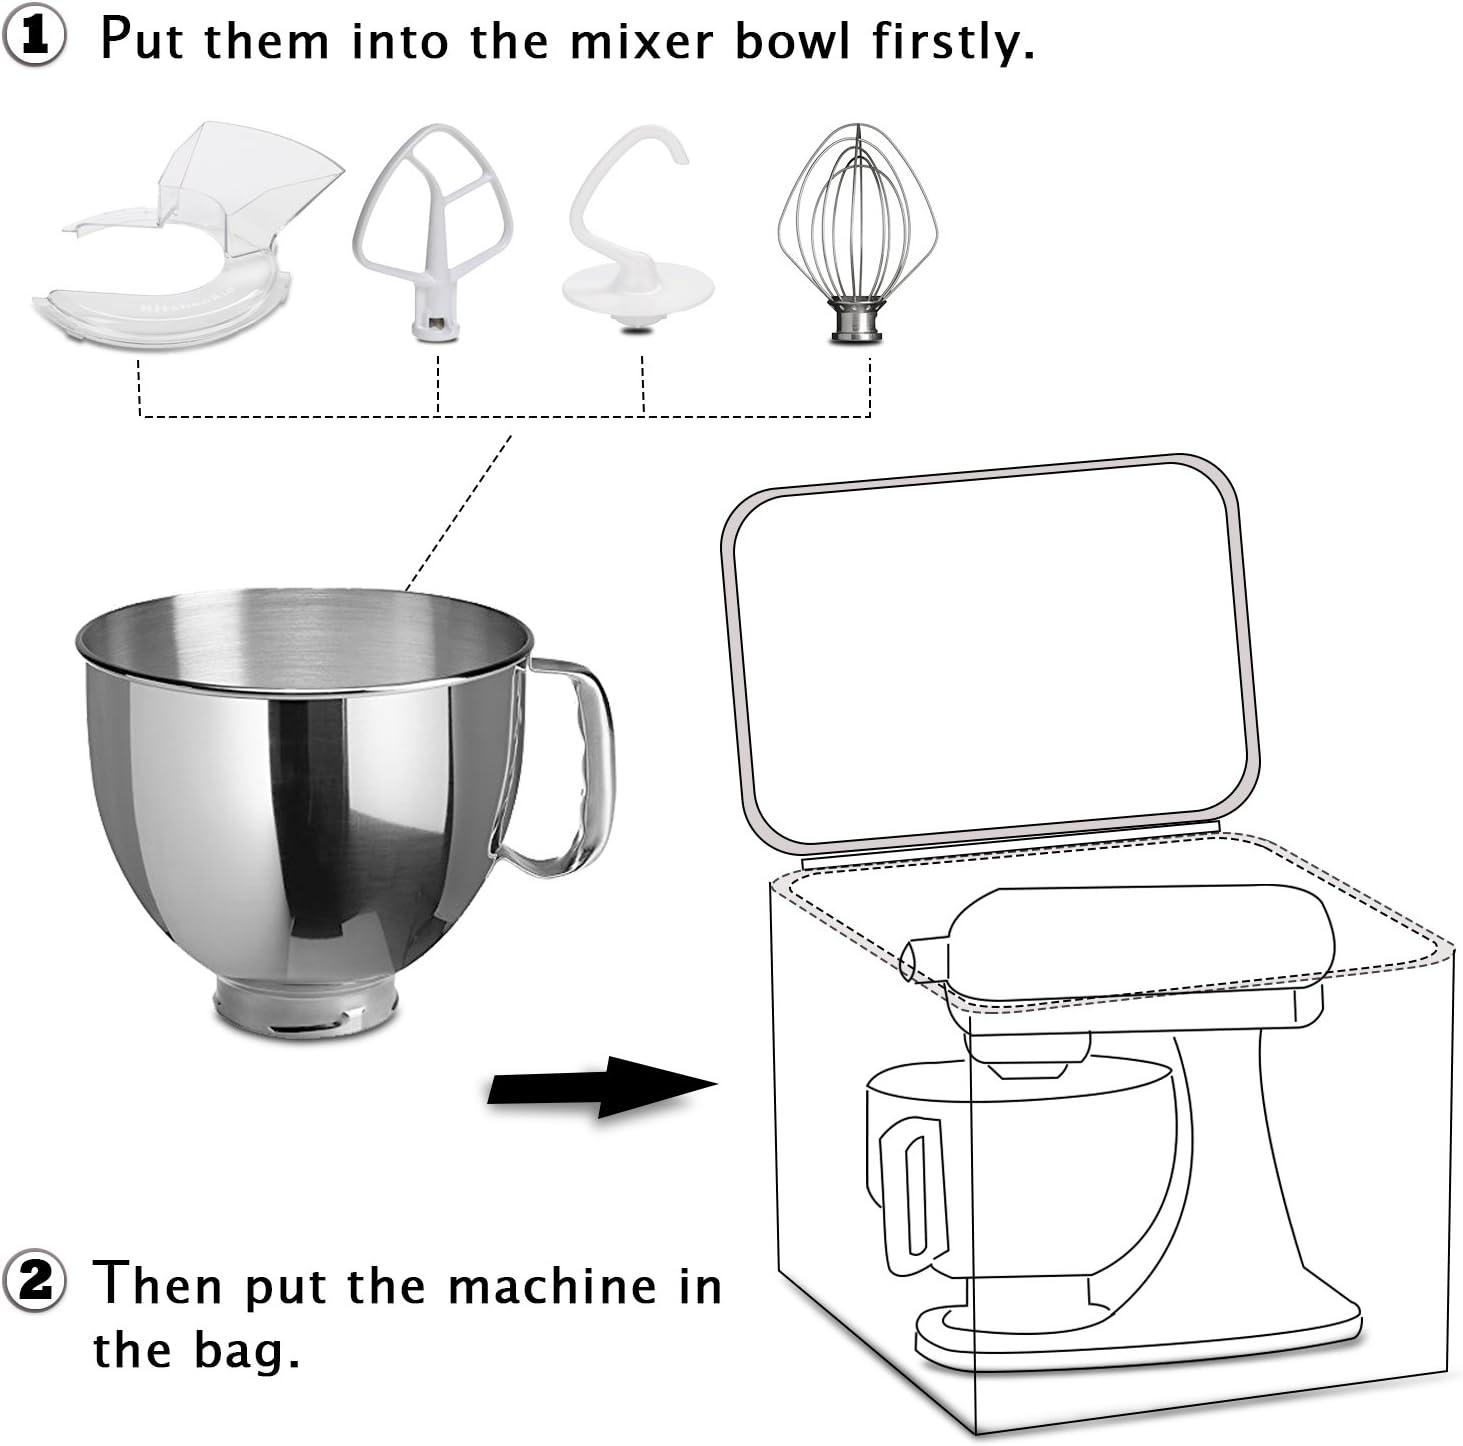 ZCGYL Housse Mixeur Kitchen Aid Sac Robot Mixeur Porte M/élangeur Sac Anti-poussi/ère